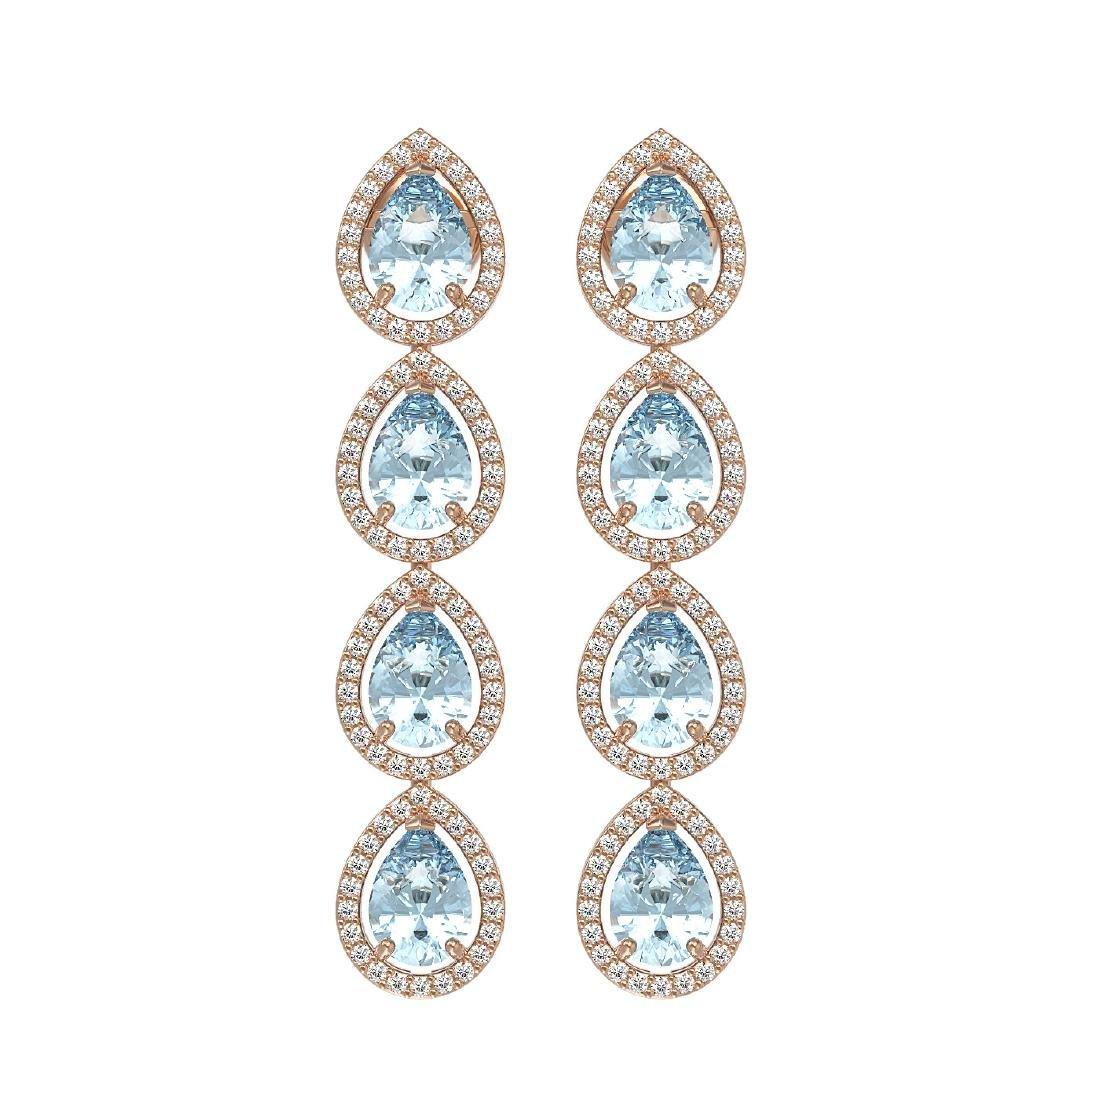 7.41 CTW Aquamarine & Diamond Halo Earrings 10K Rose